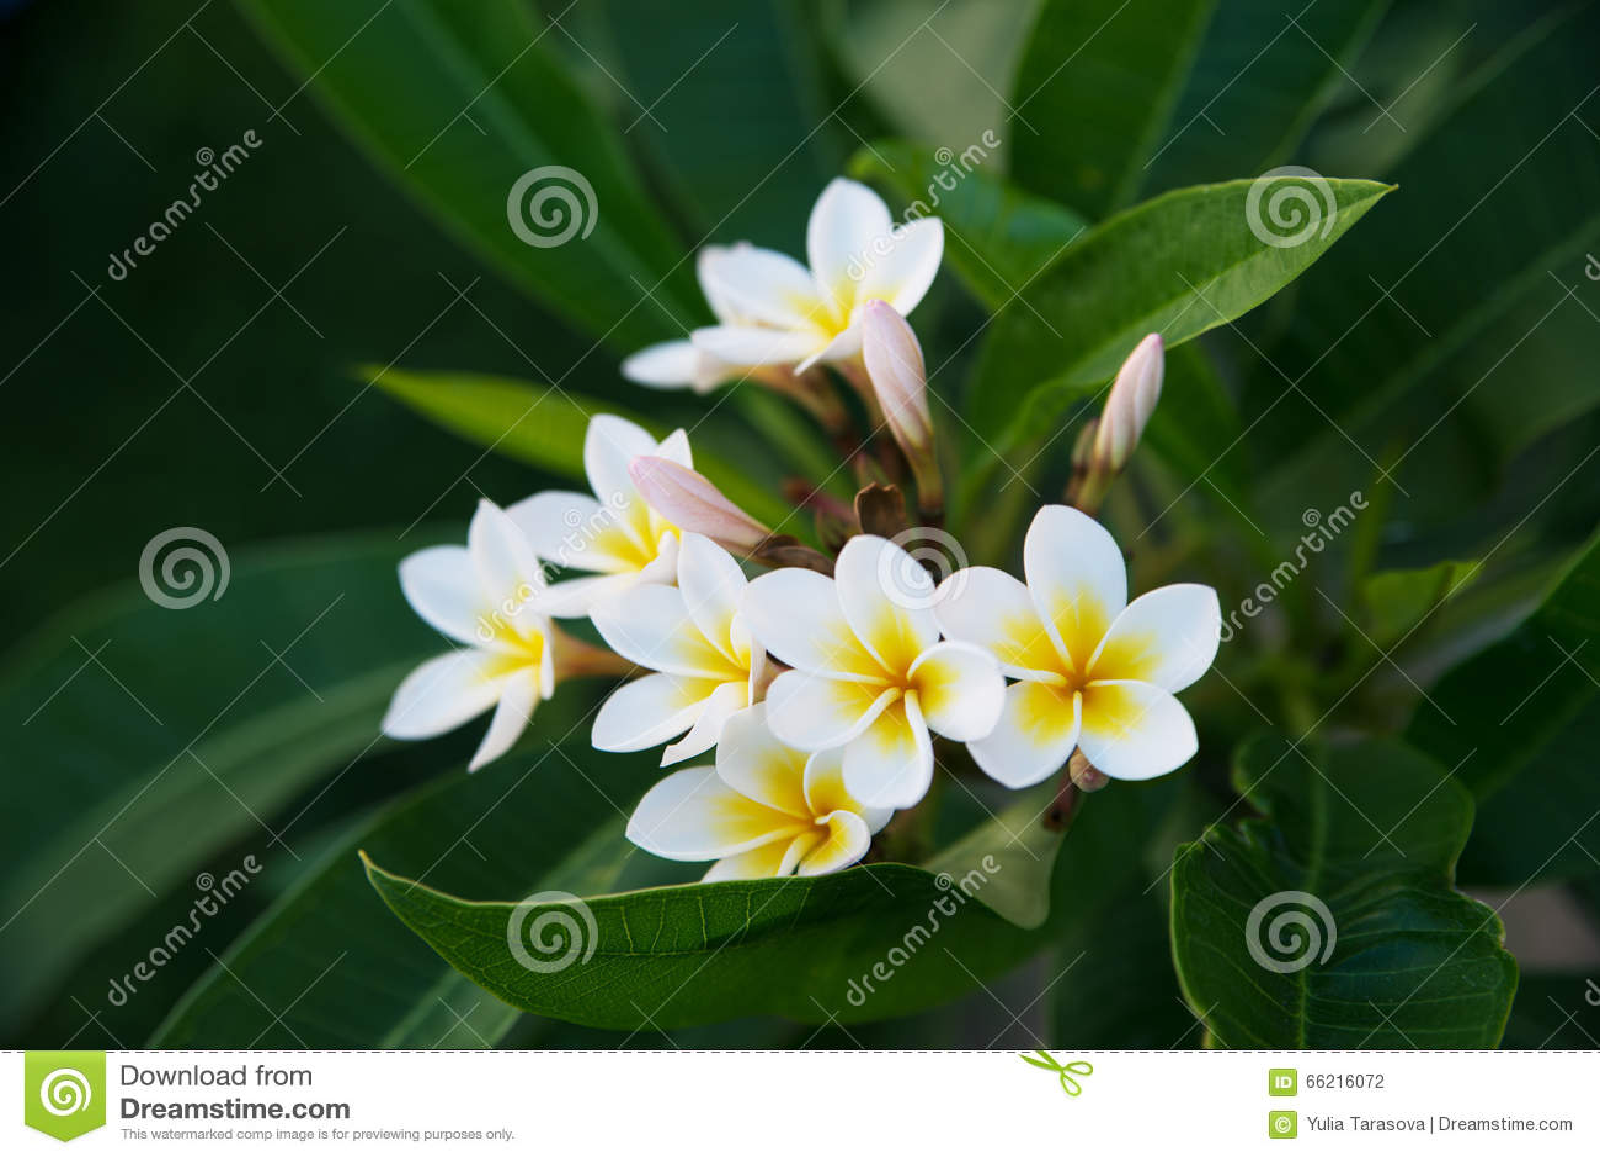 White Frangipani Tropical Flower Plumeria Flower Blooming On Tree